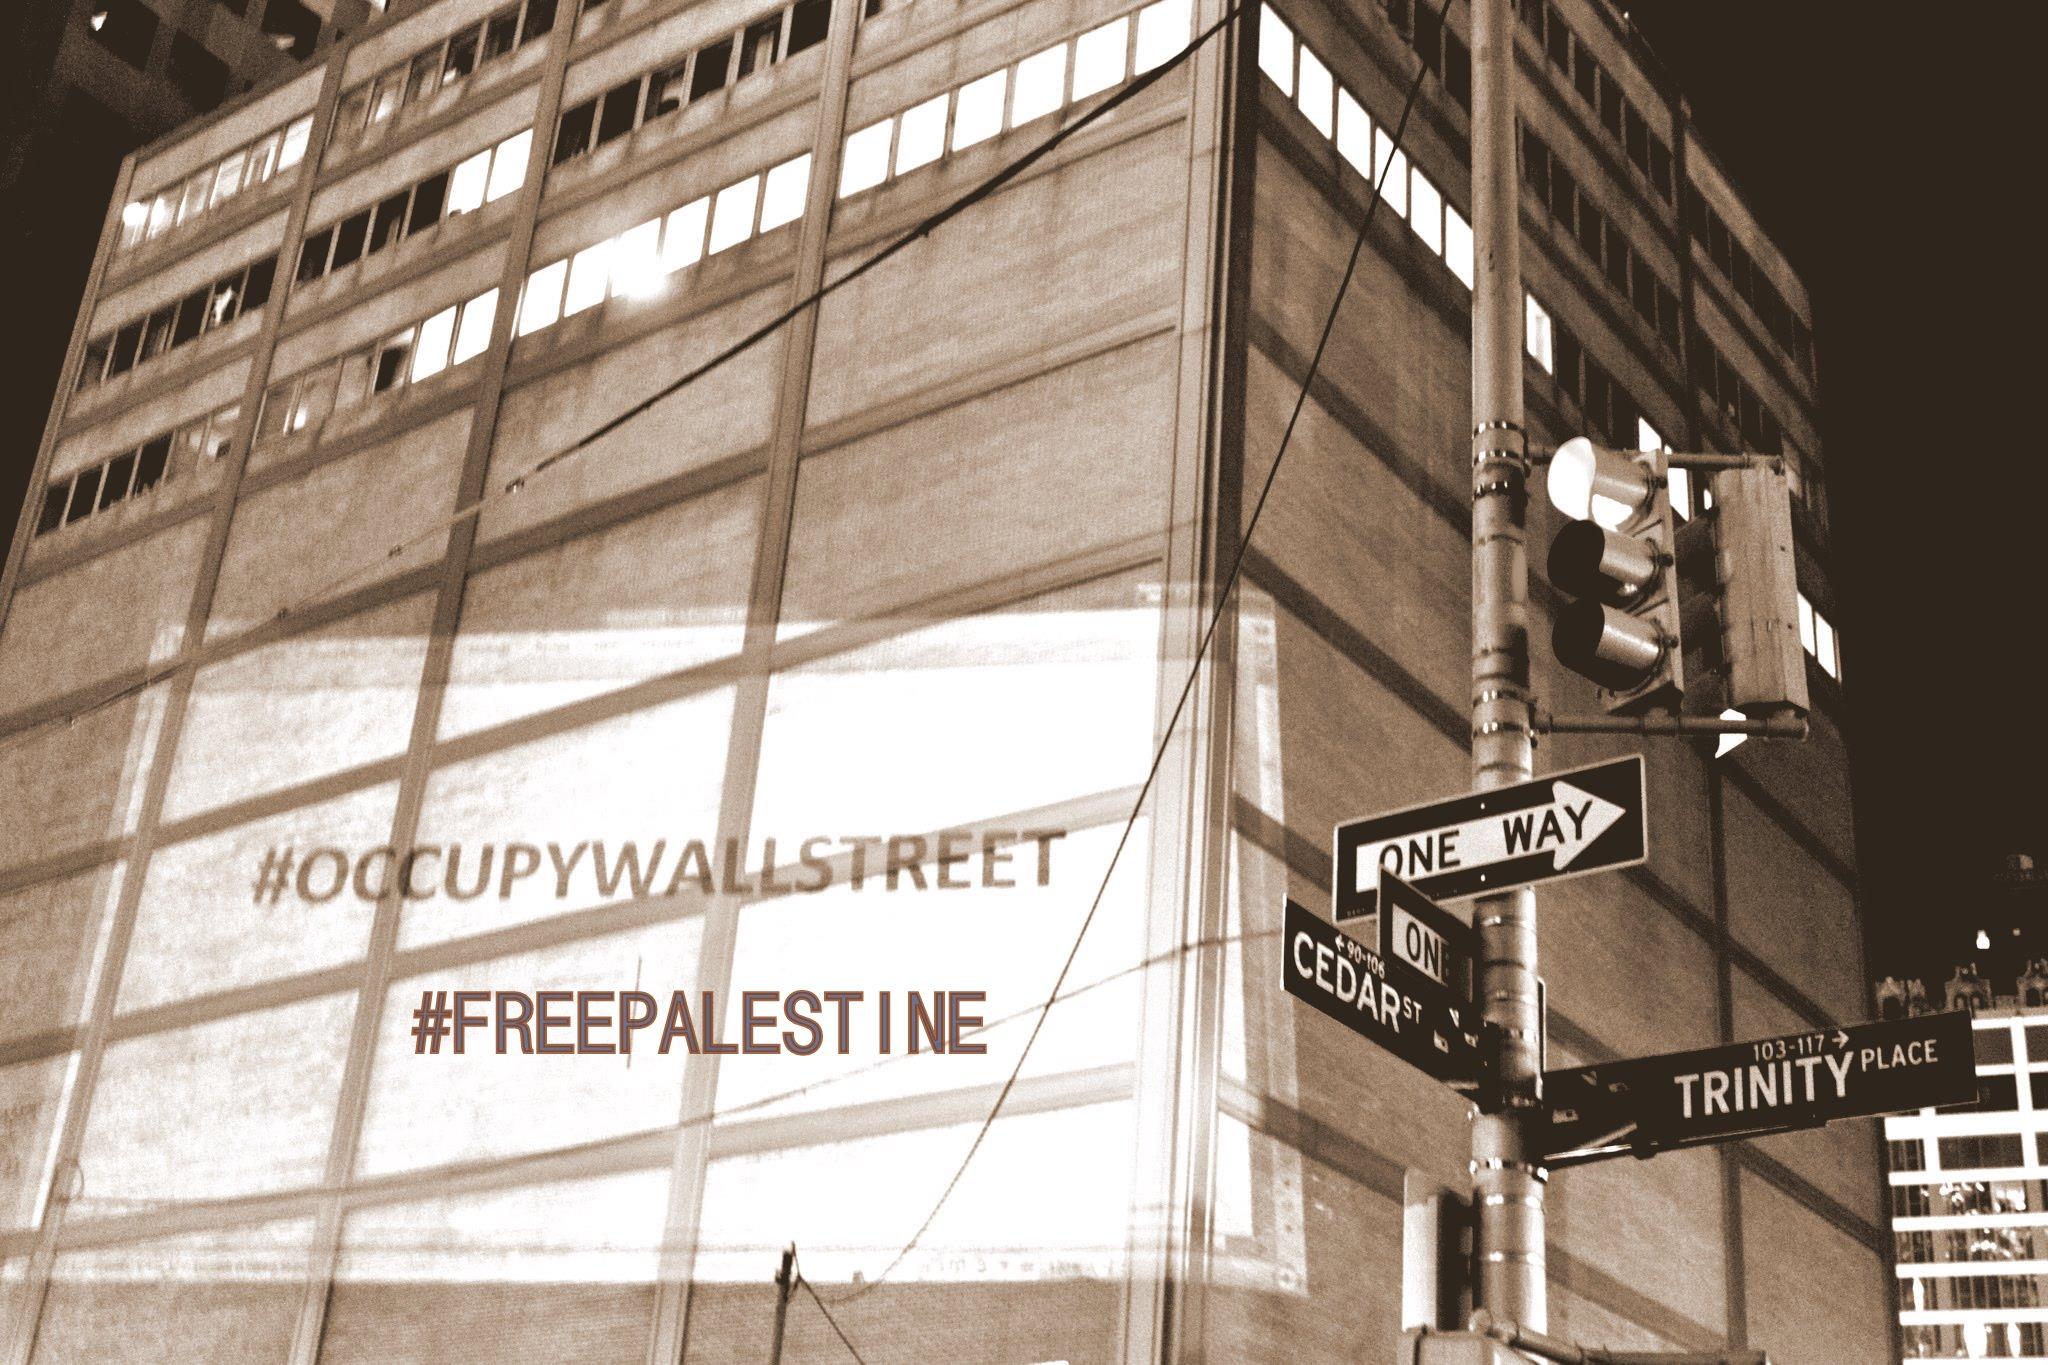 2011-10-17-OccupyWallStreet.jpg